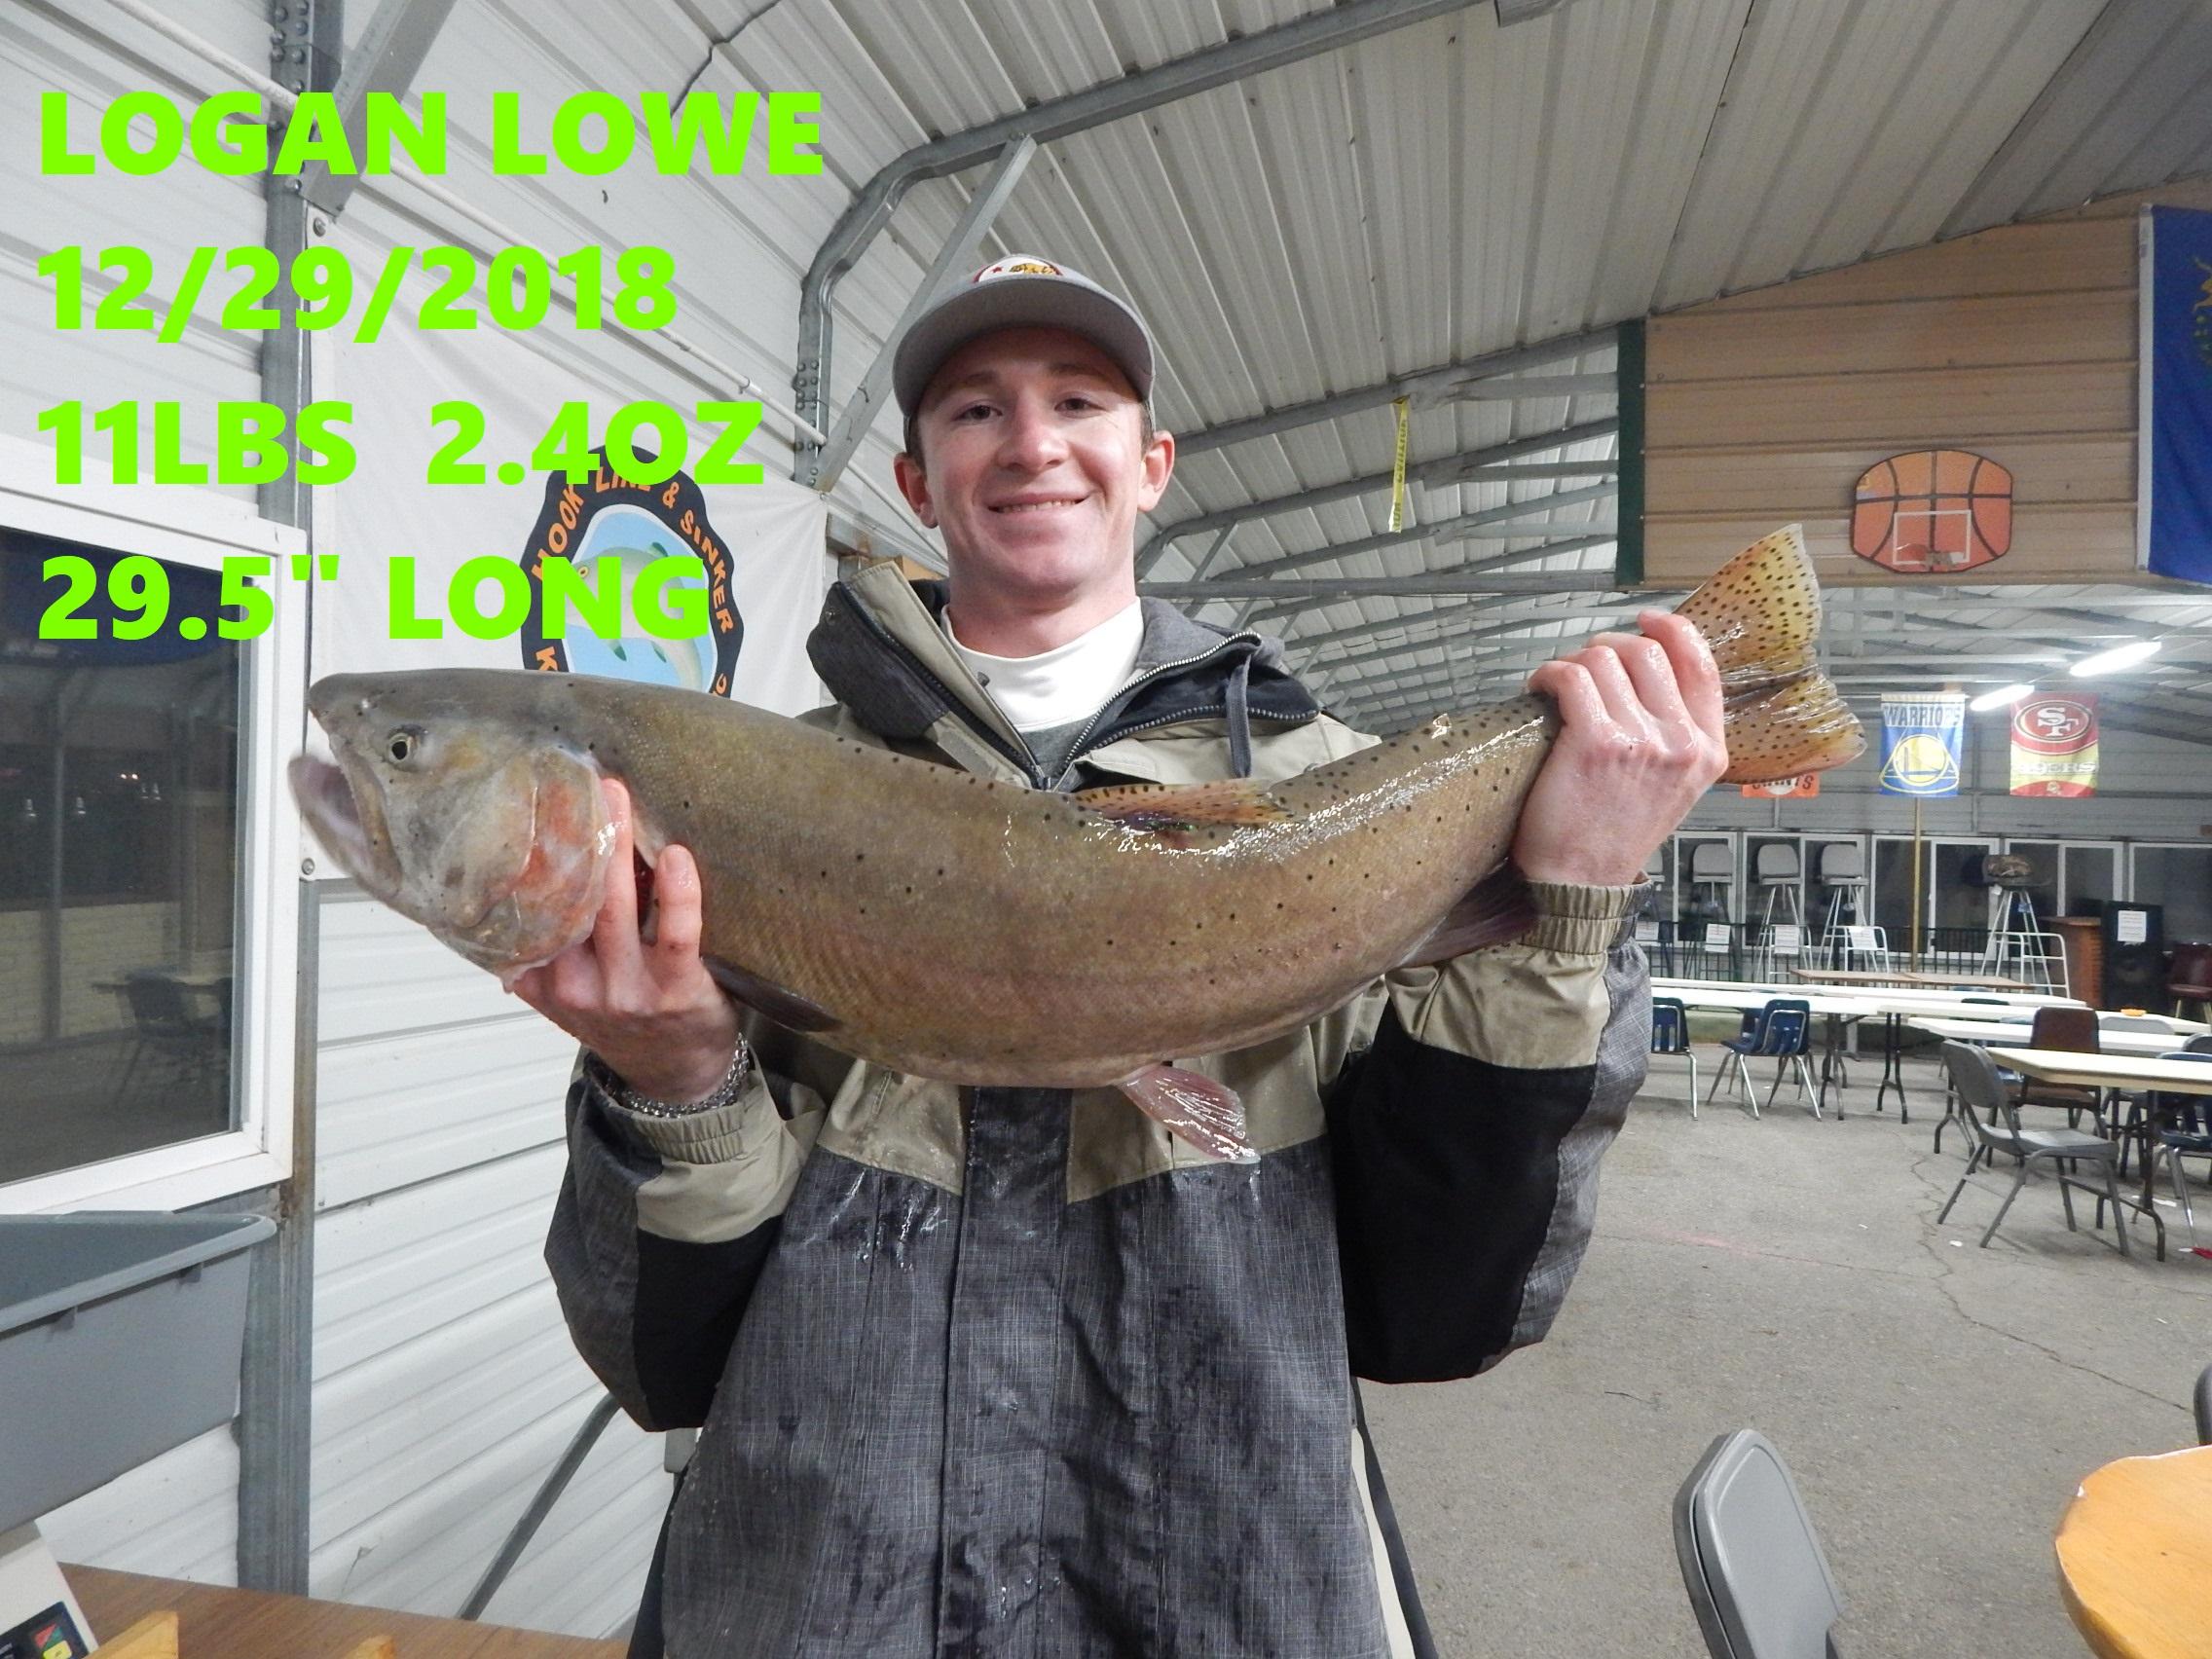 LOGAN LOWE.jpg